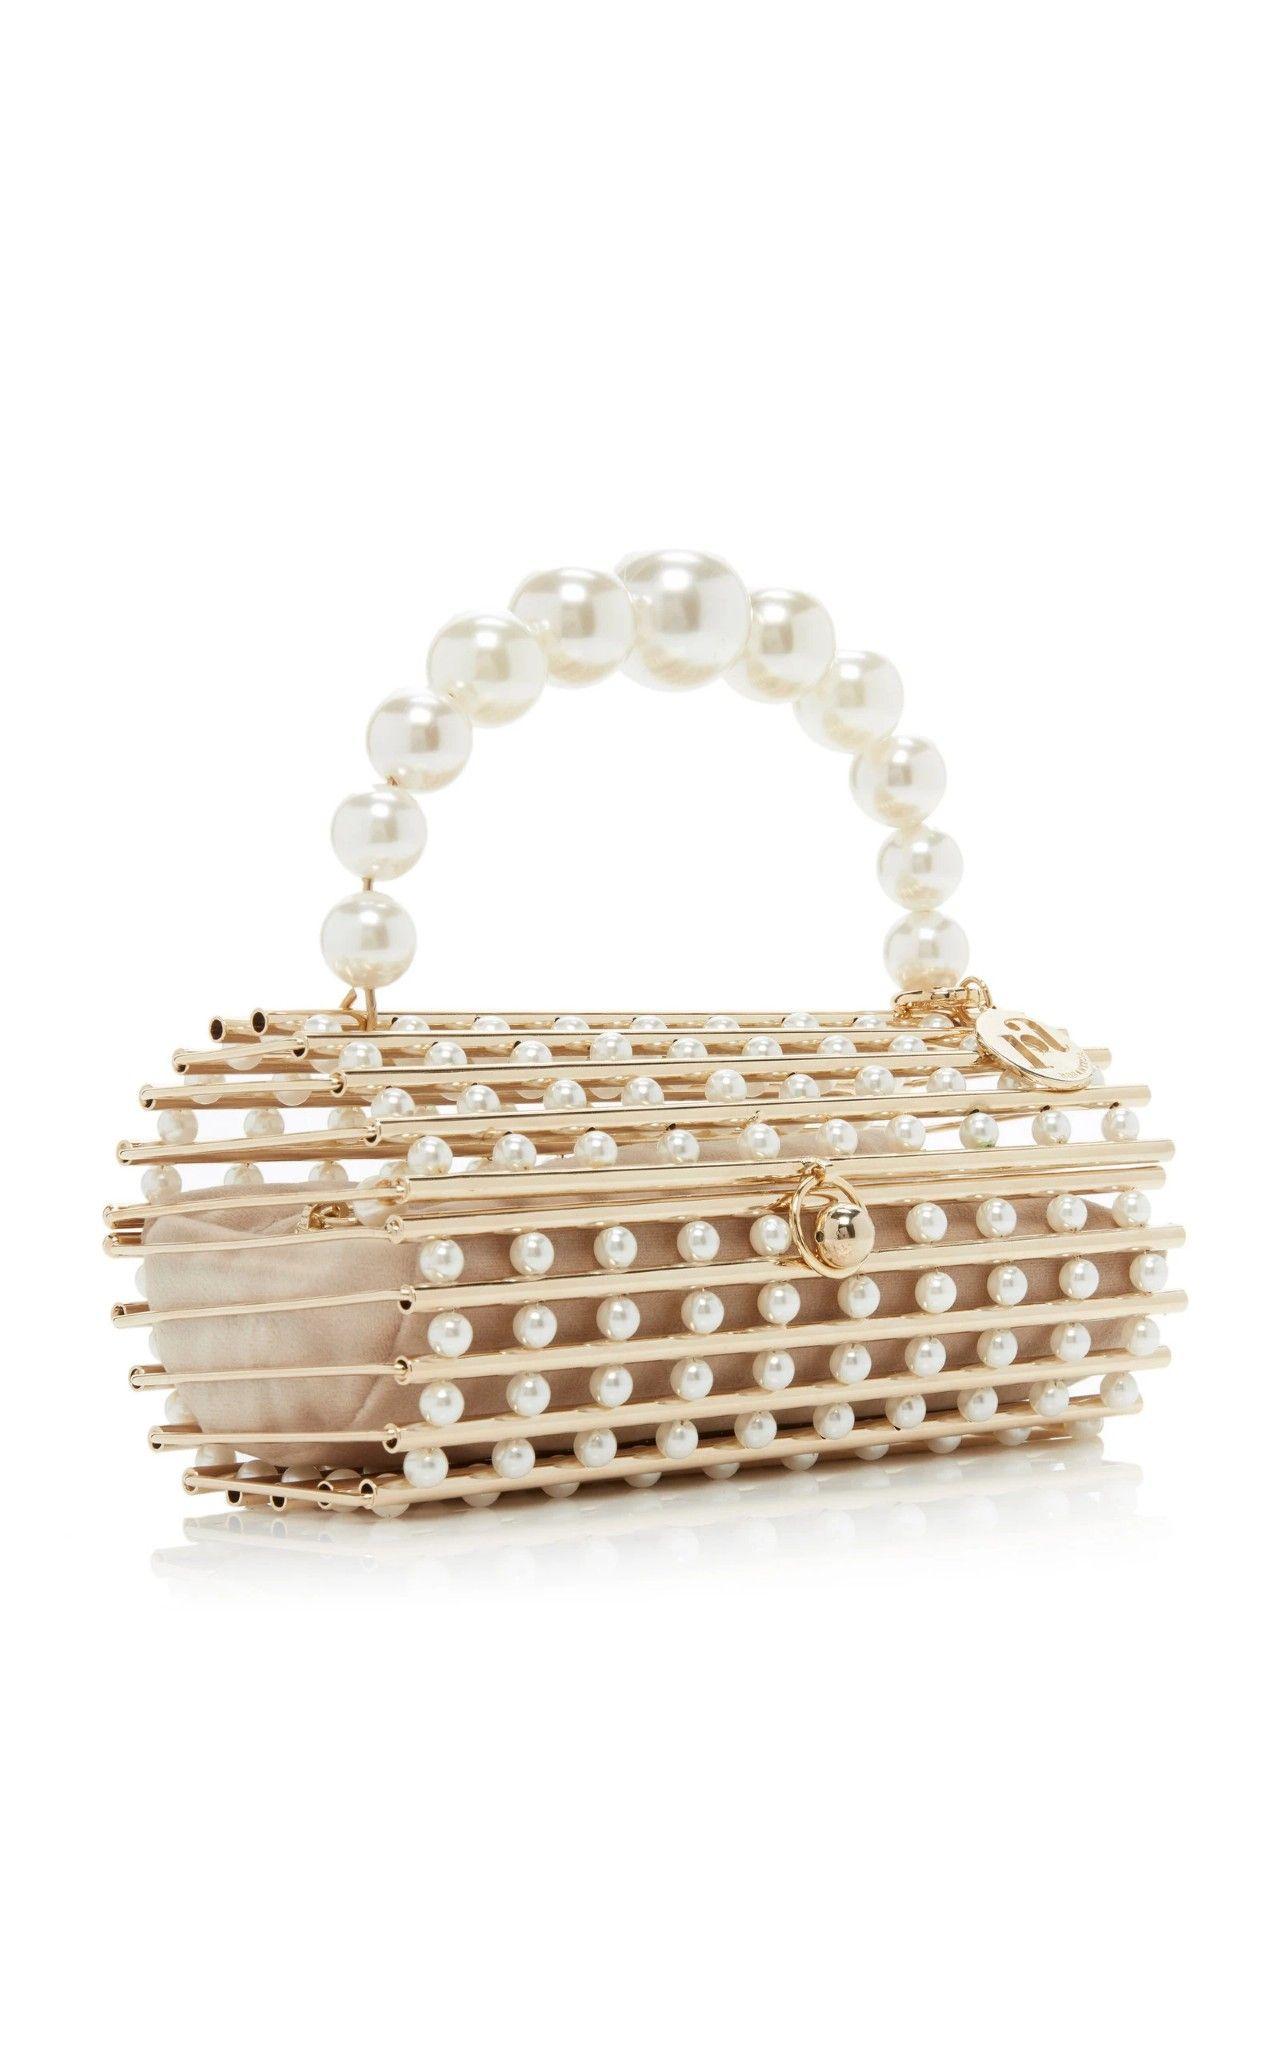 Rosantica Medea Gold Tone Pearl Embellished Top Handle Bag 2020 Boncuklu Cantalar Canta Tasarimi Aksesuarlar